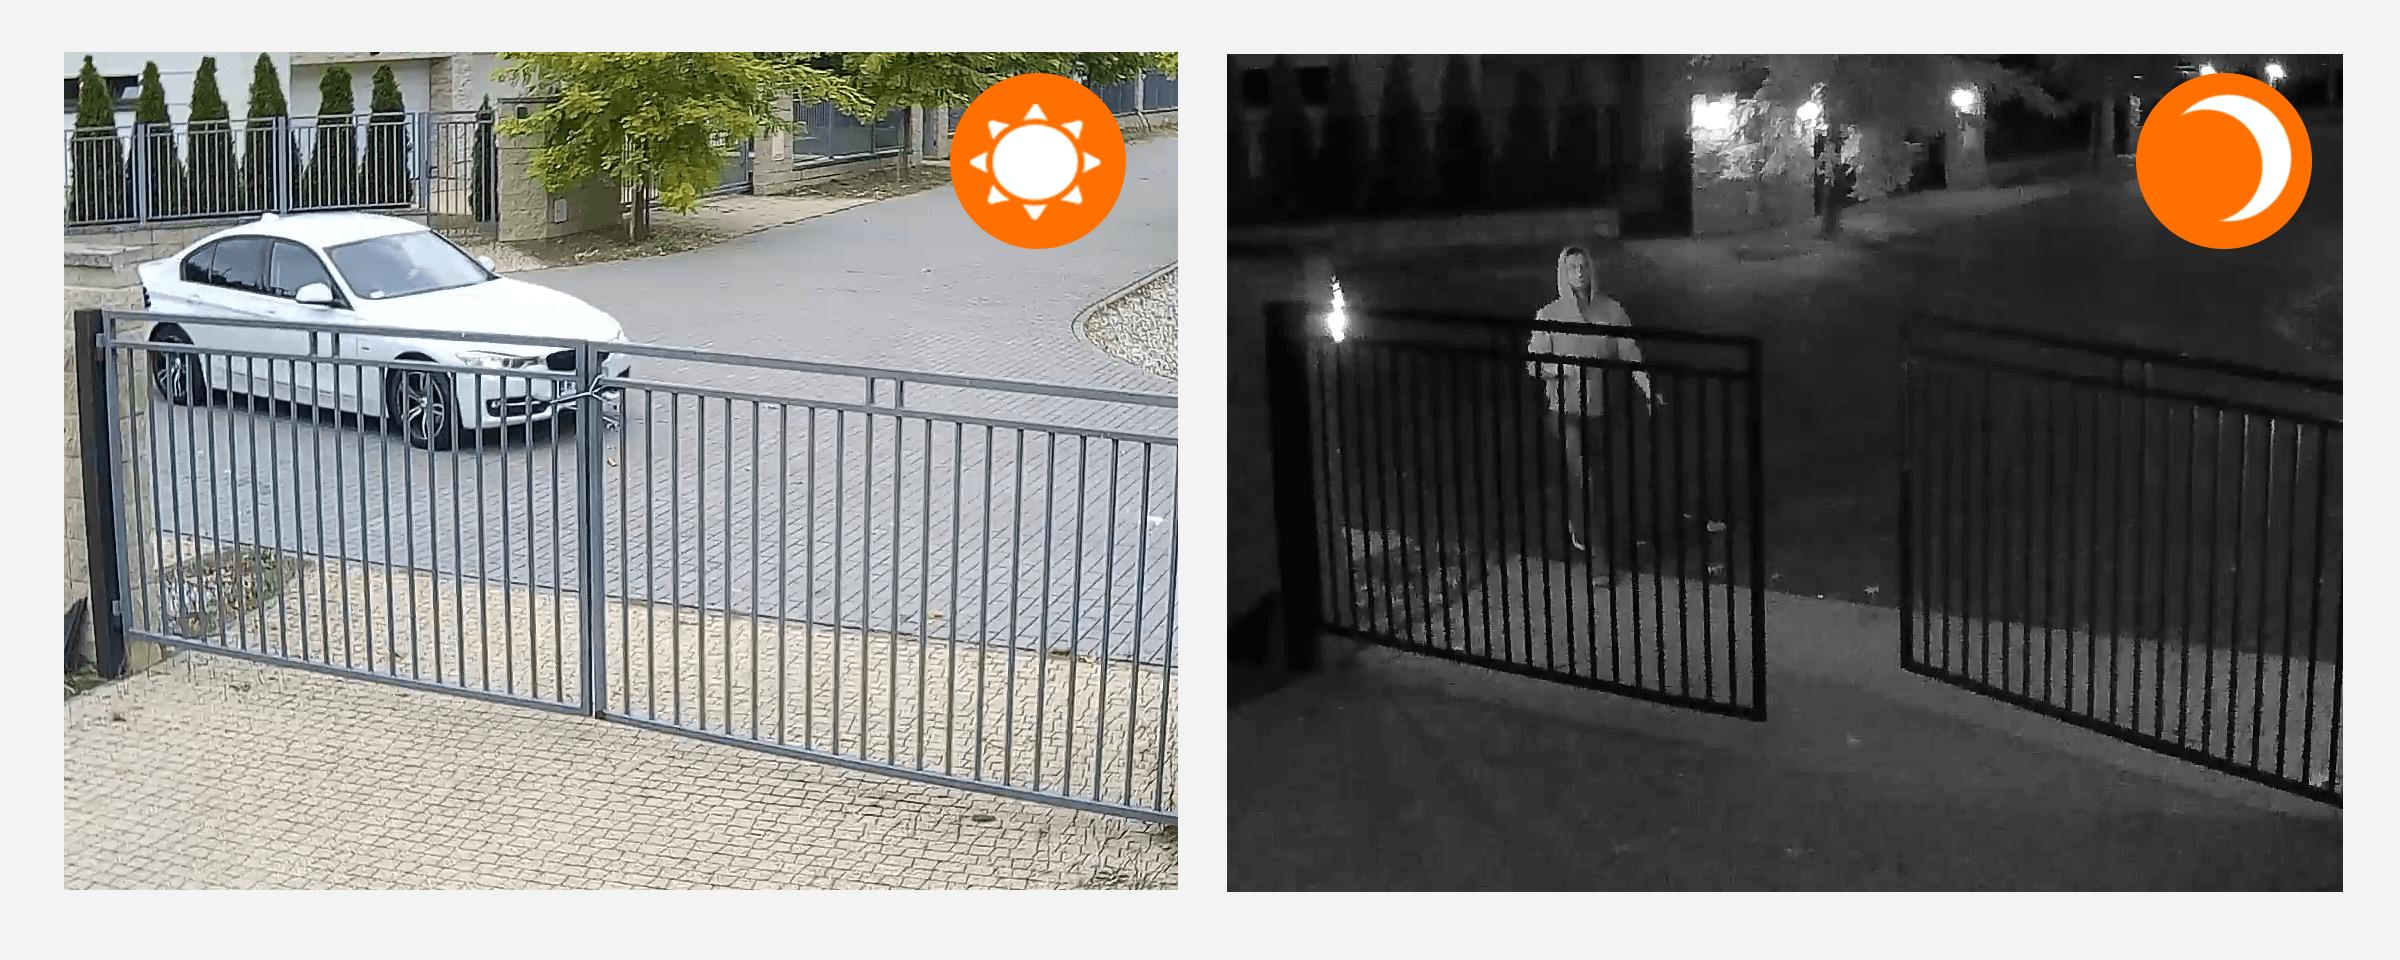 kamera gsm z alarmem widok dzien noc orllo.pl